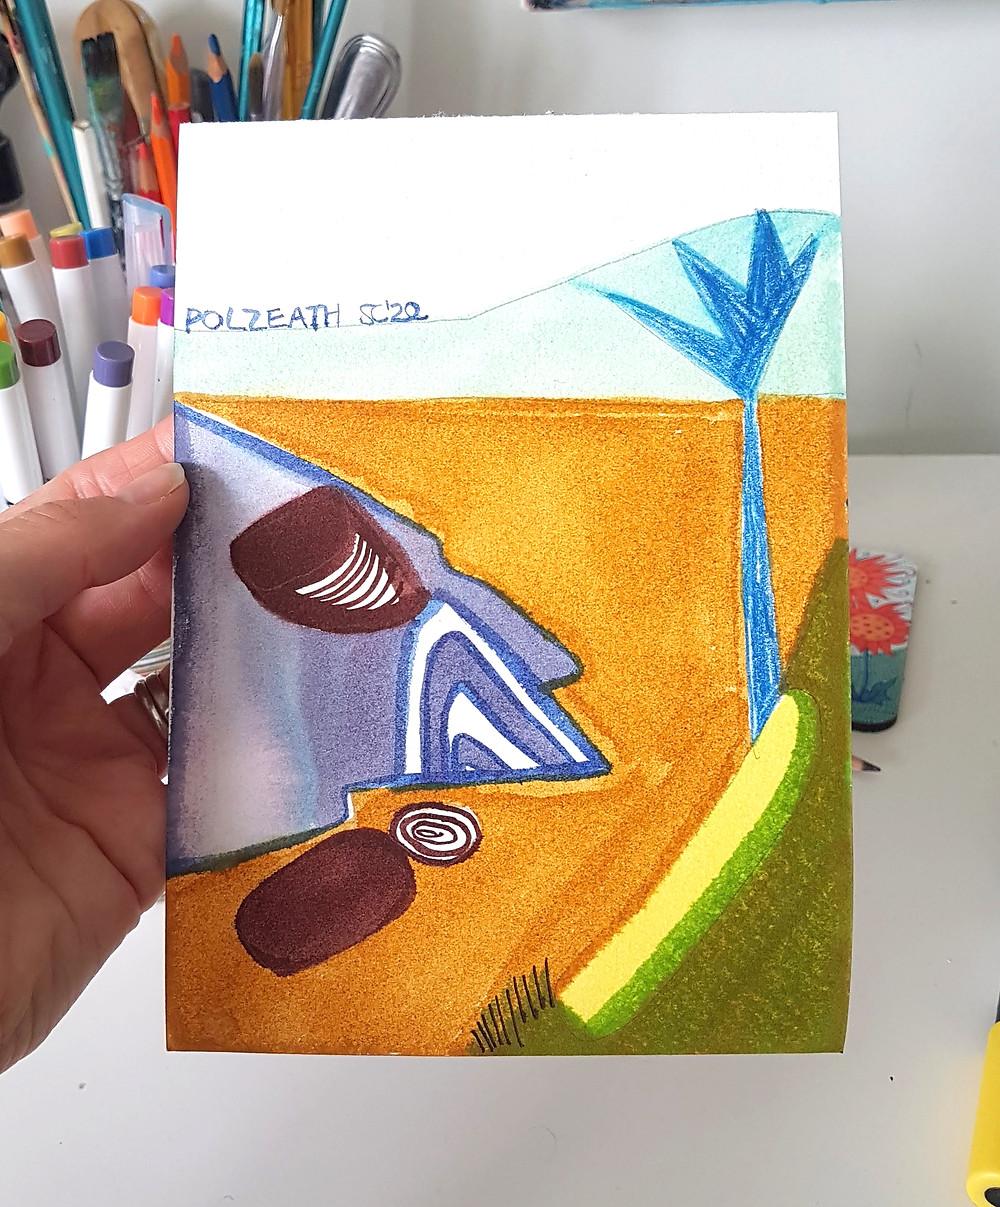 Polzeath by Suzie Cumming